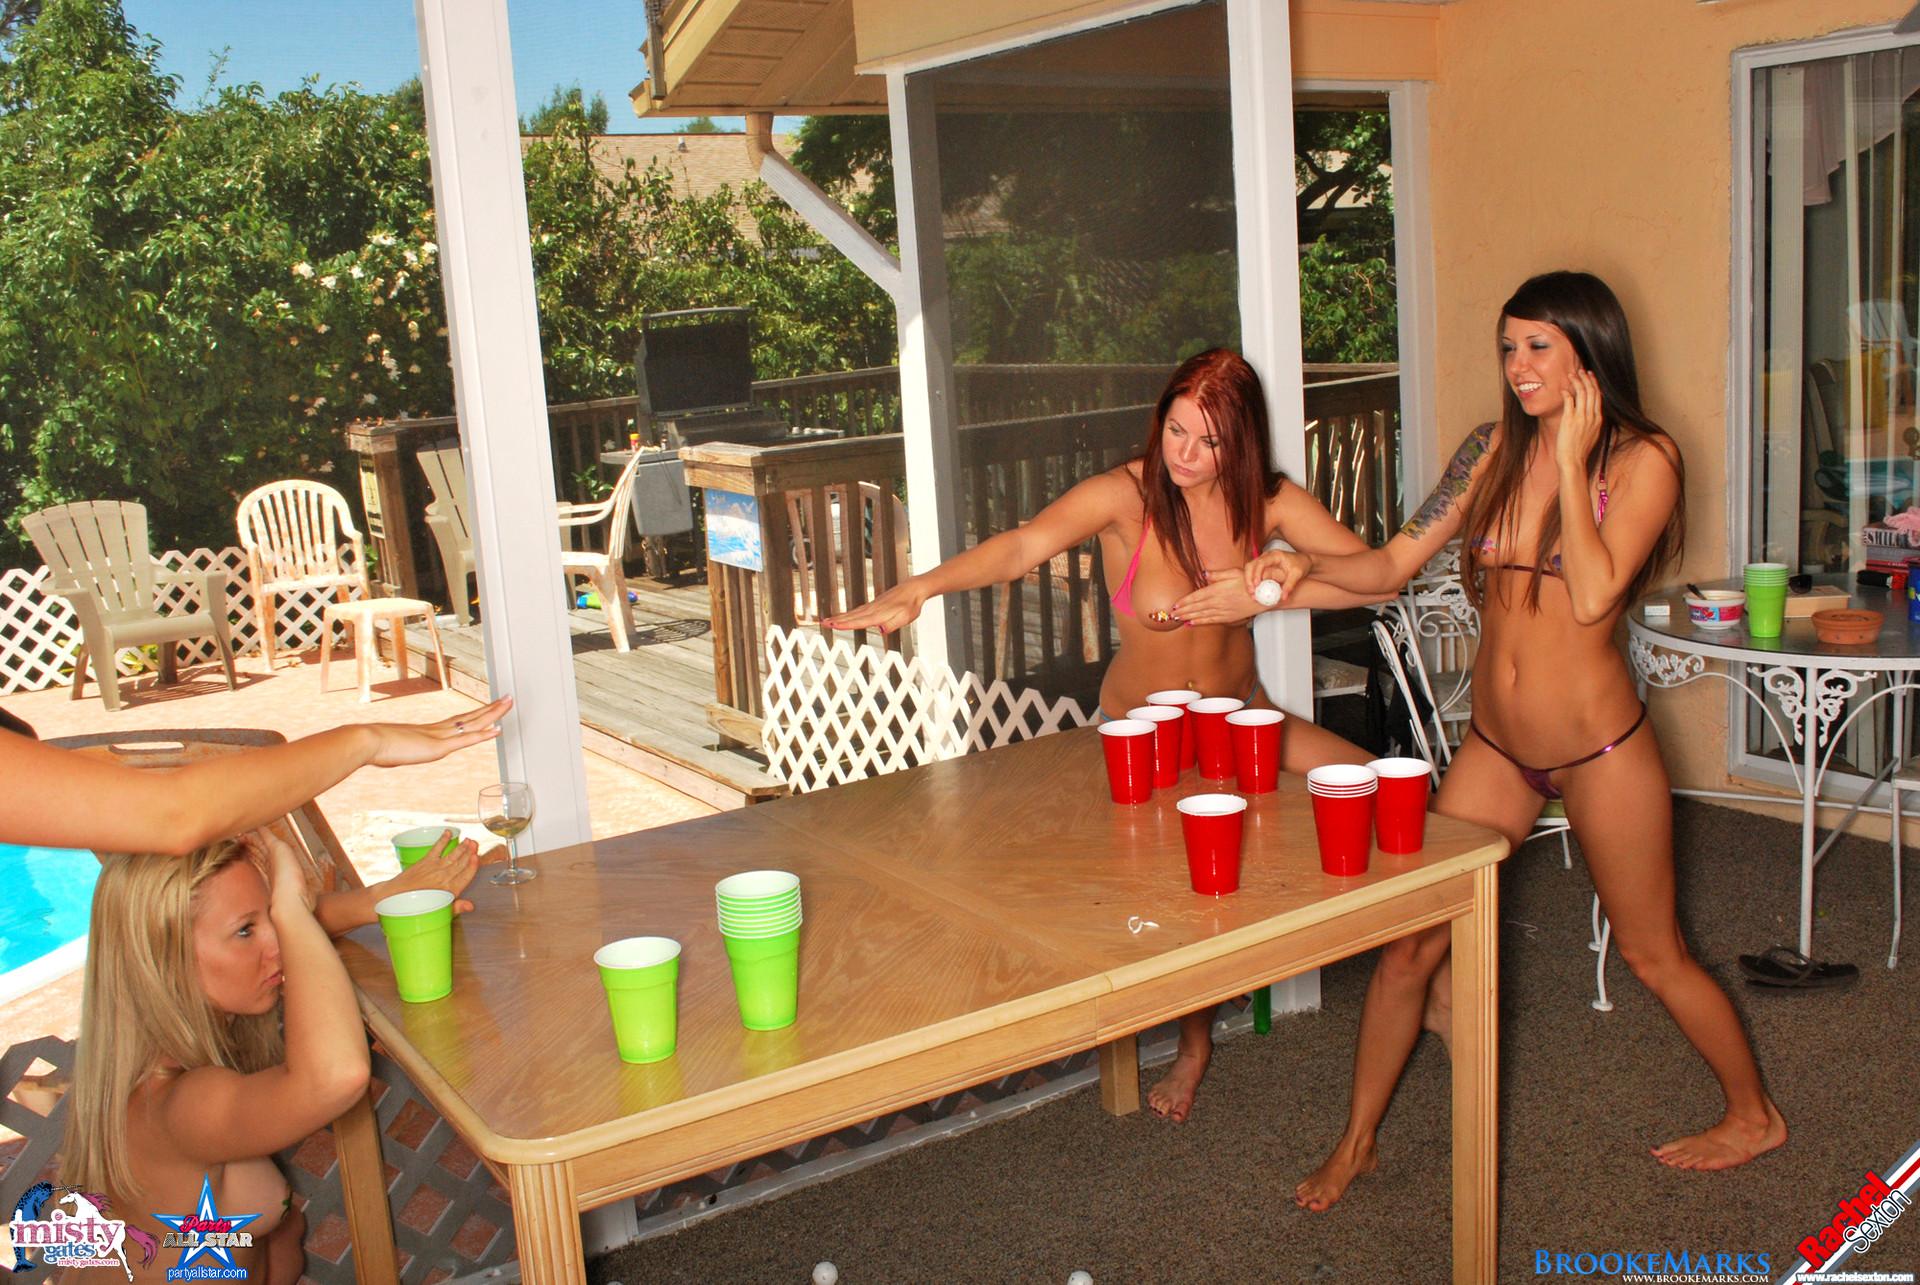 Strip beer pong naked video, africa mom sex